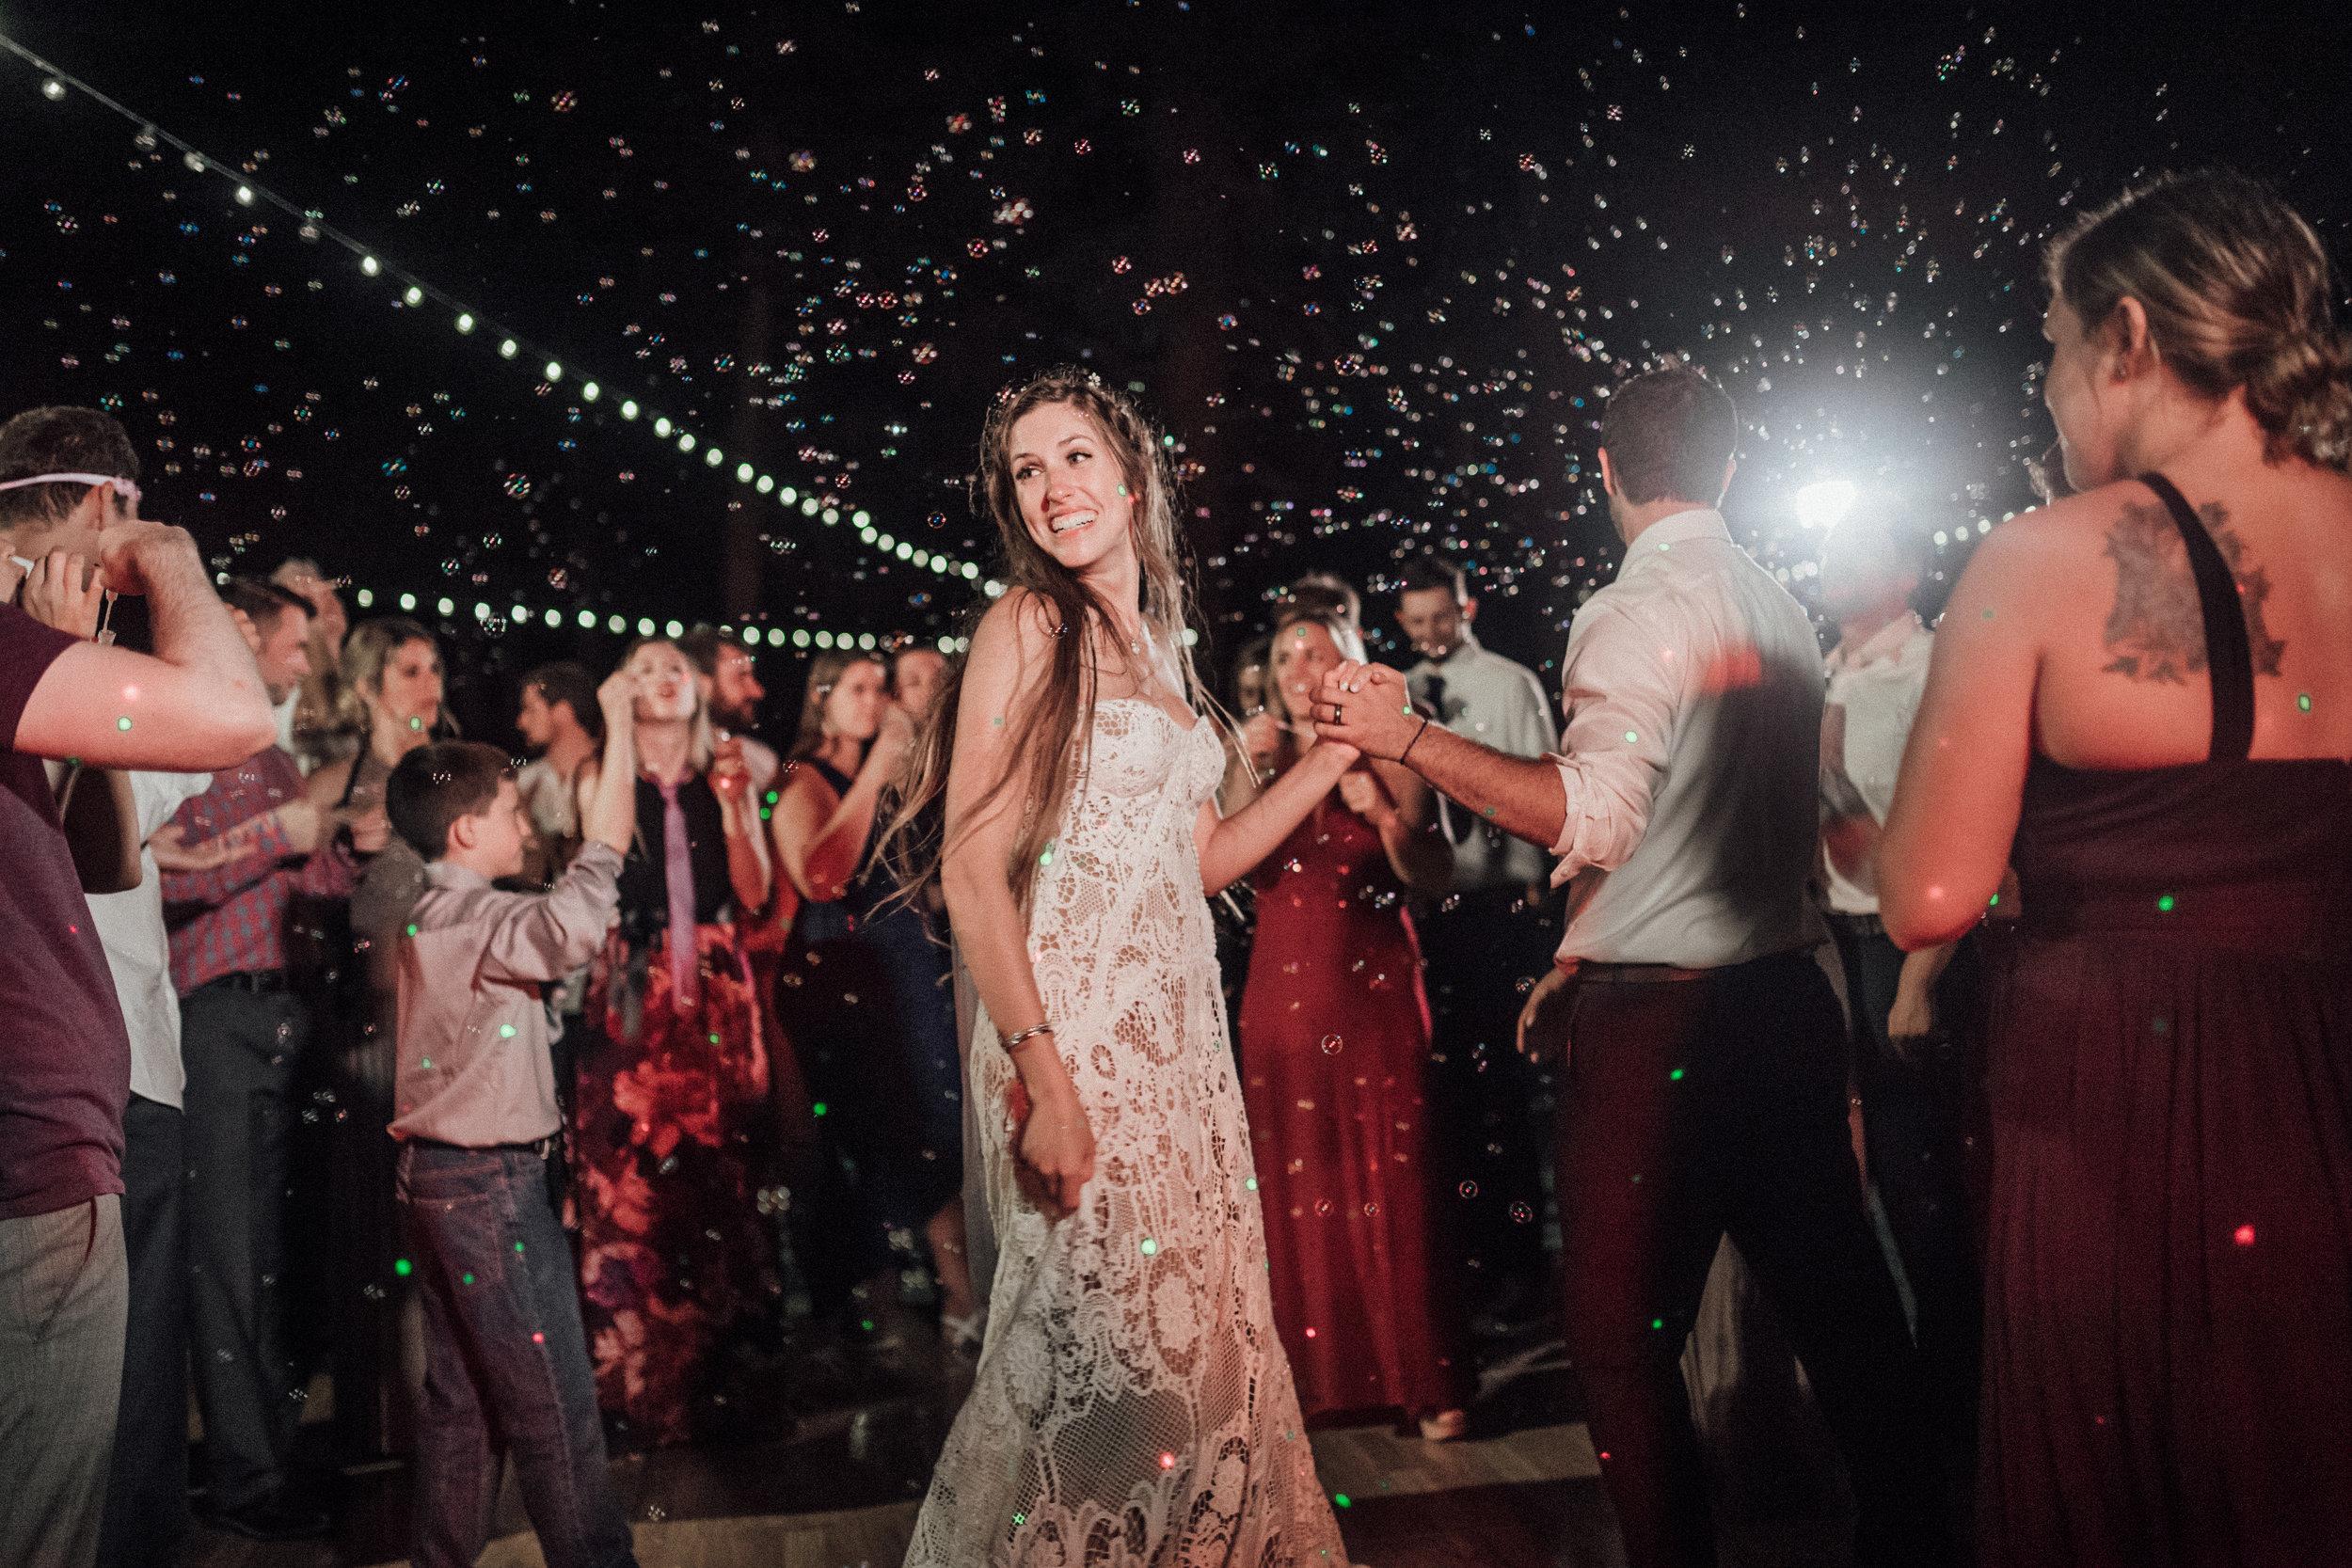 may-wedding-dancing-pines-sierraville-wedding-ca-danielle-kyle-junebug-photography-lake-tahoe-1-2864.jpg